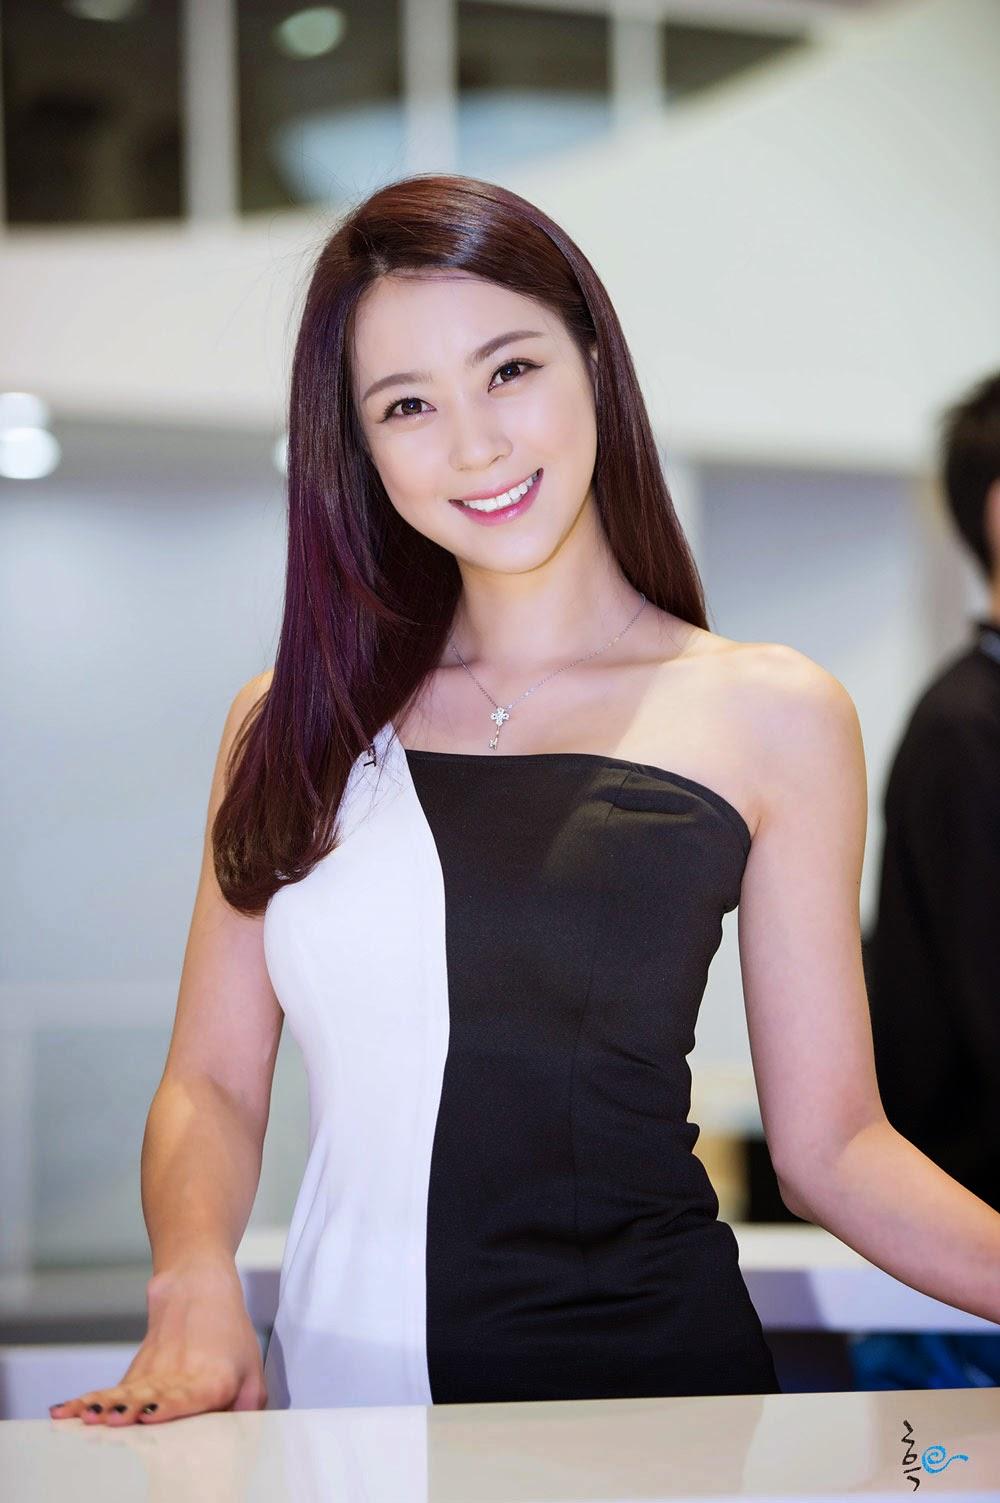 Han Song Yee at G-STAR 2014 | Korean HD Girls